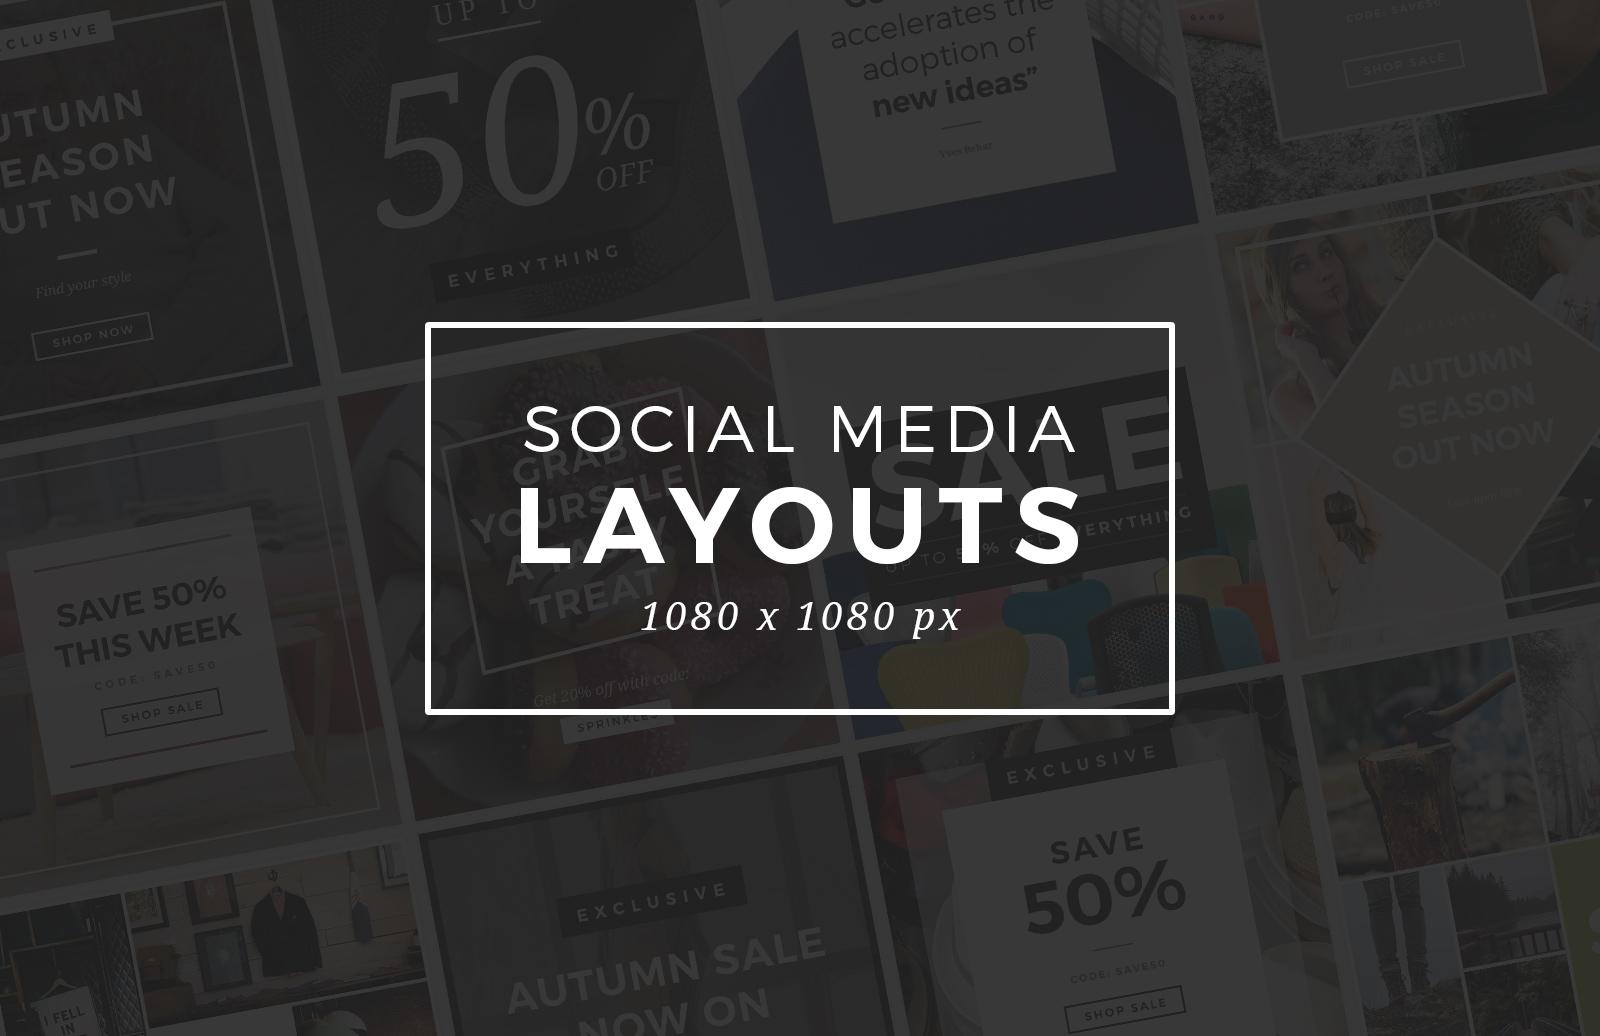 Social Media Layouts 1